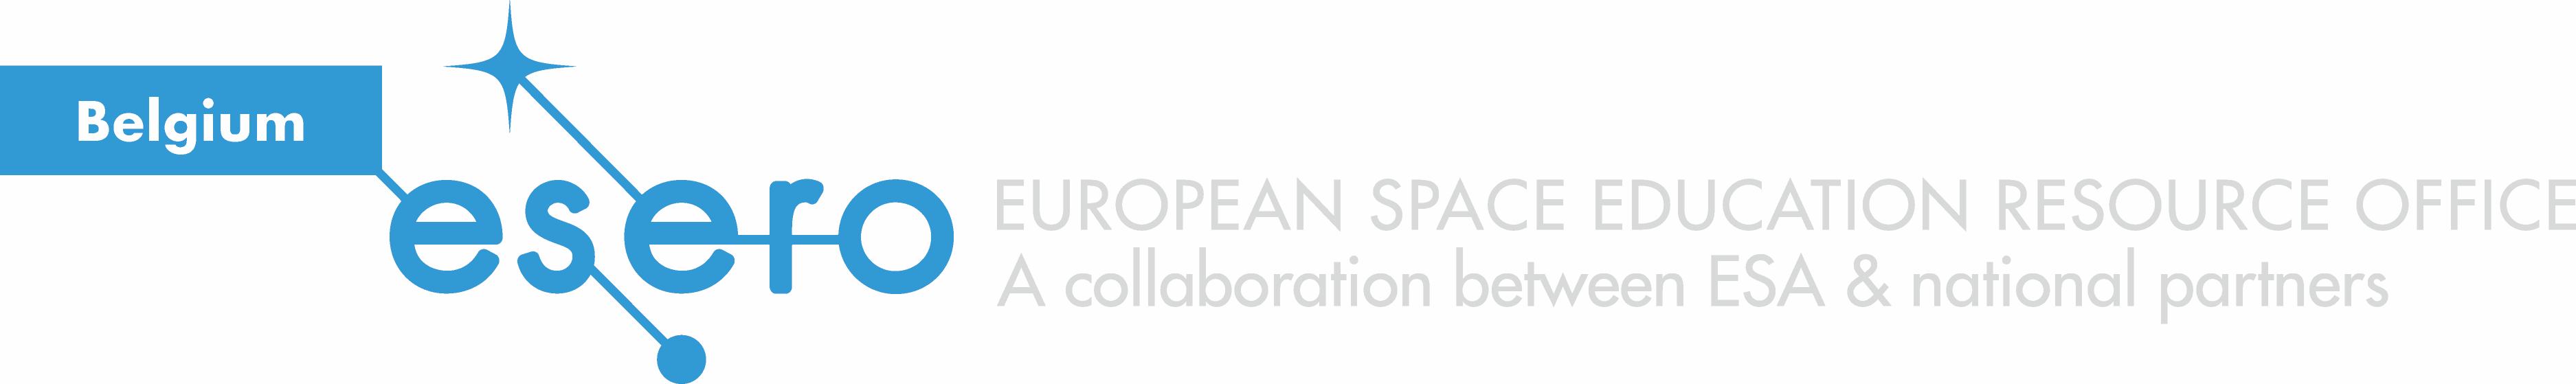 ESERO Belgium Logo